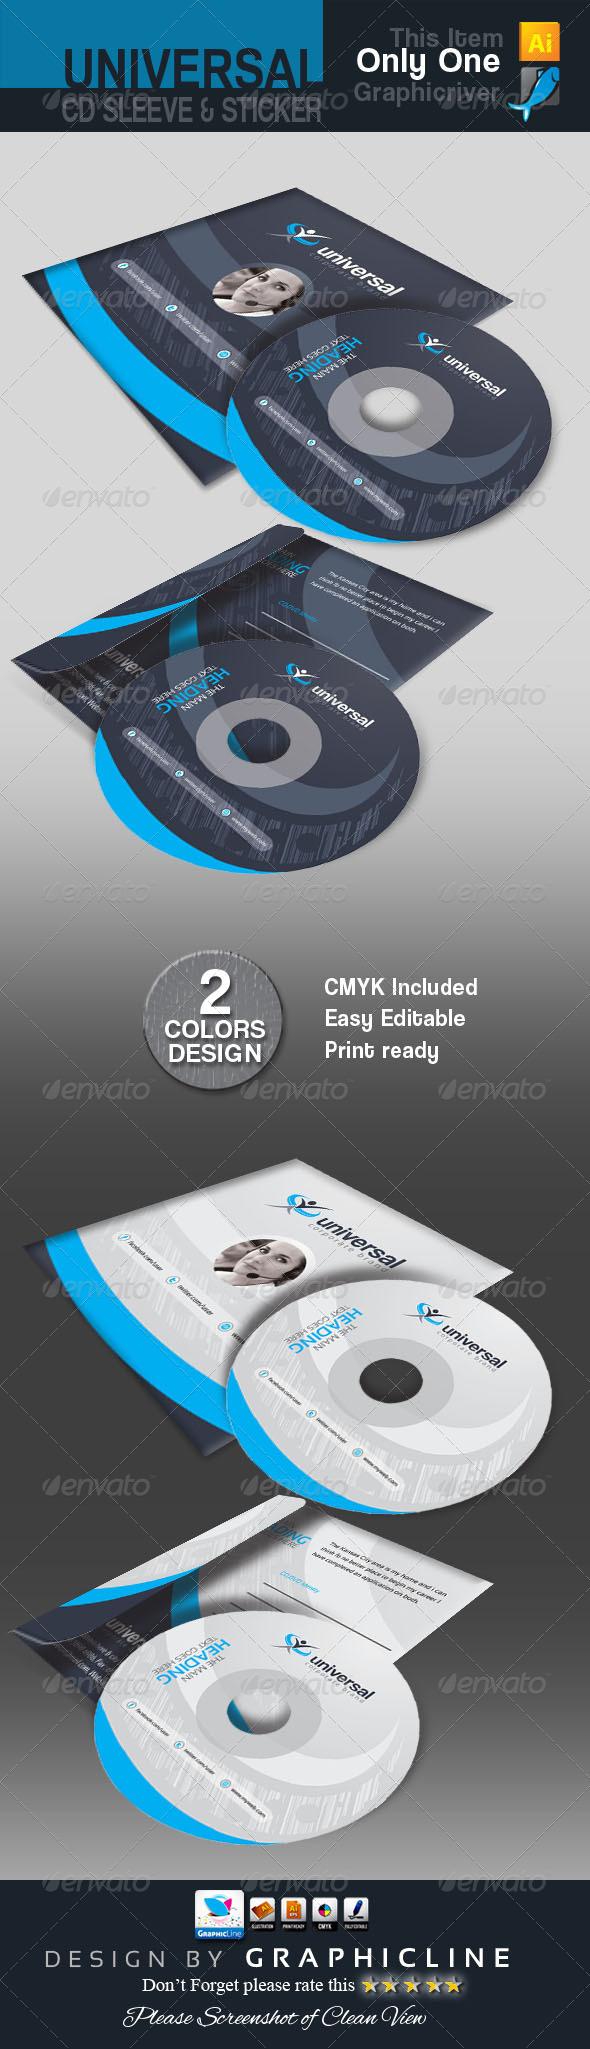 GraphicRiver Universal CD Sleeve & Sticker Design 7469926